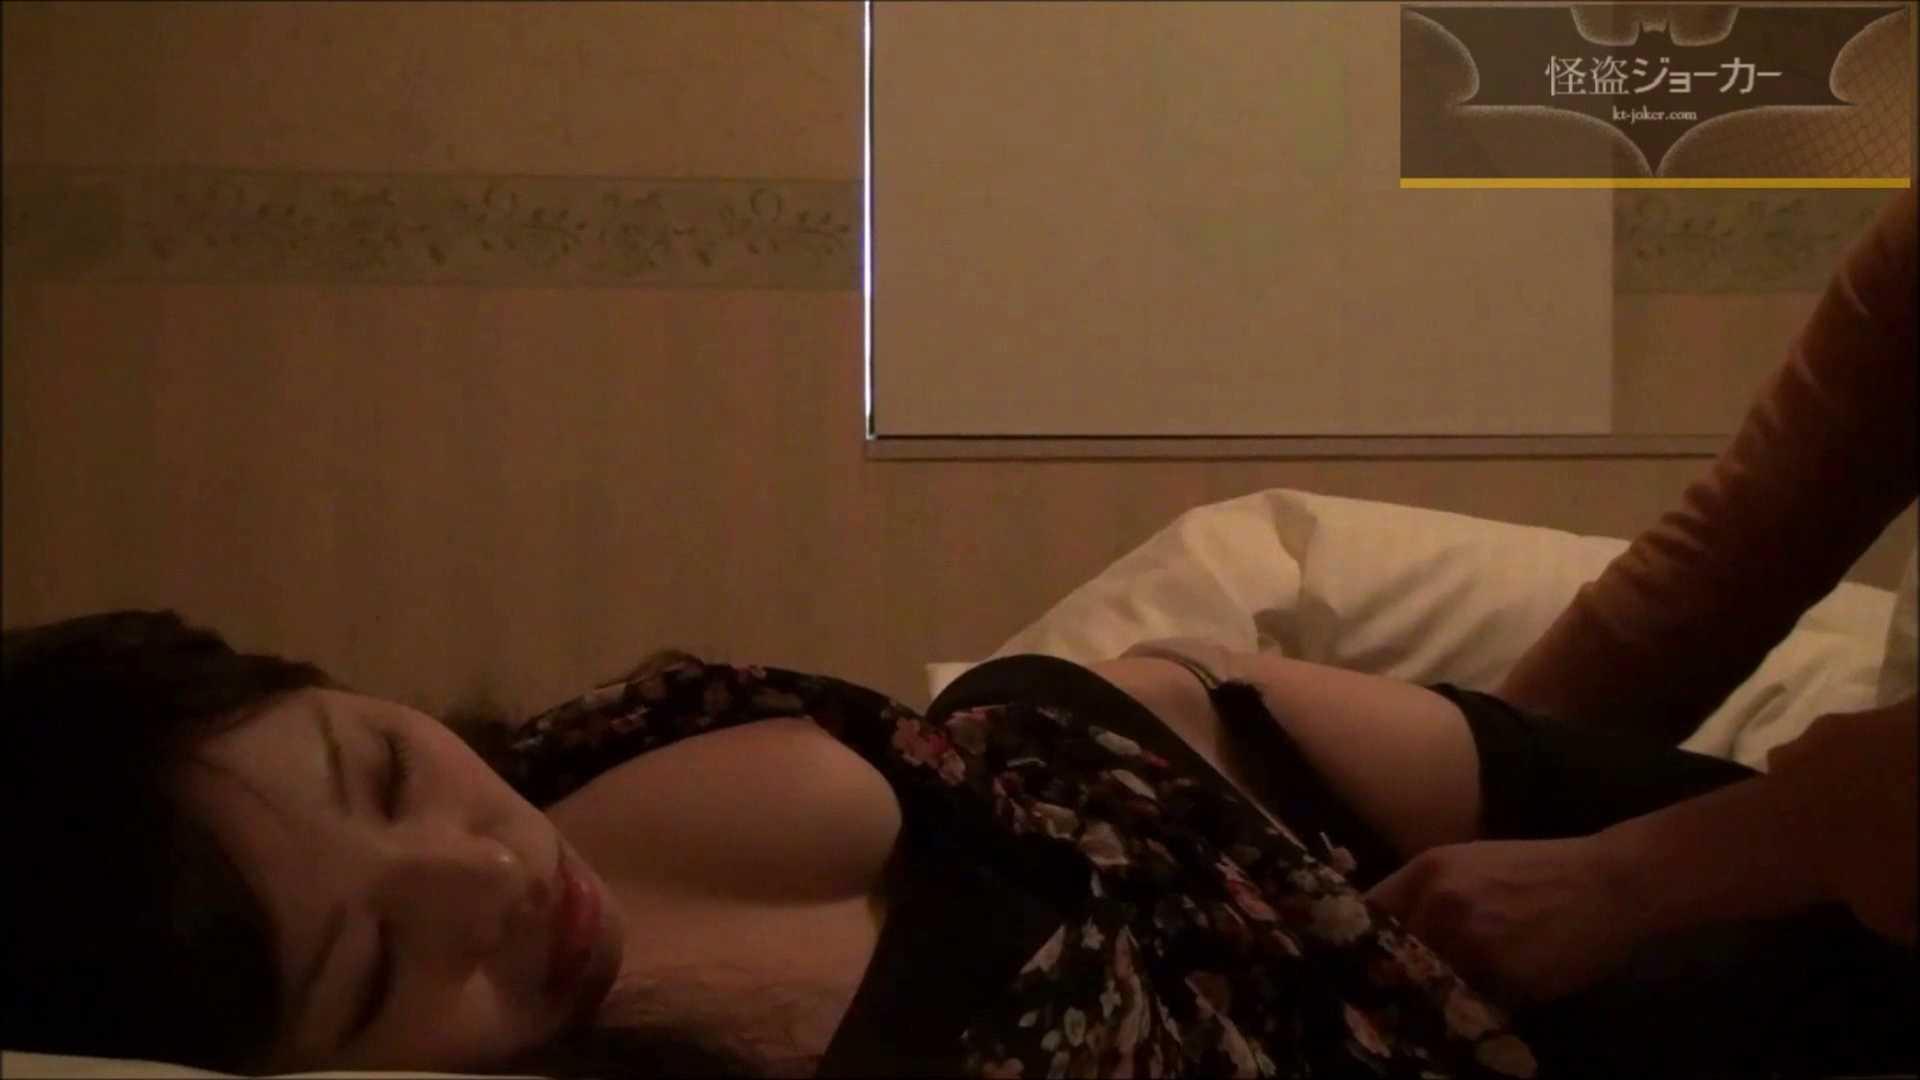 vol.17 葵の顔面にアレを押し付けてw フェラ動画 われめAV動画紹介 107画像 53